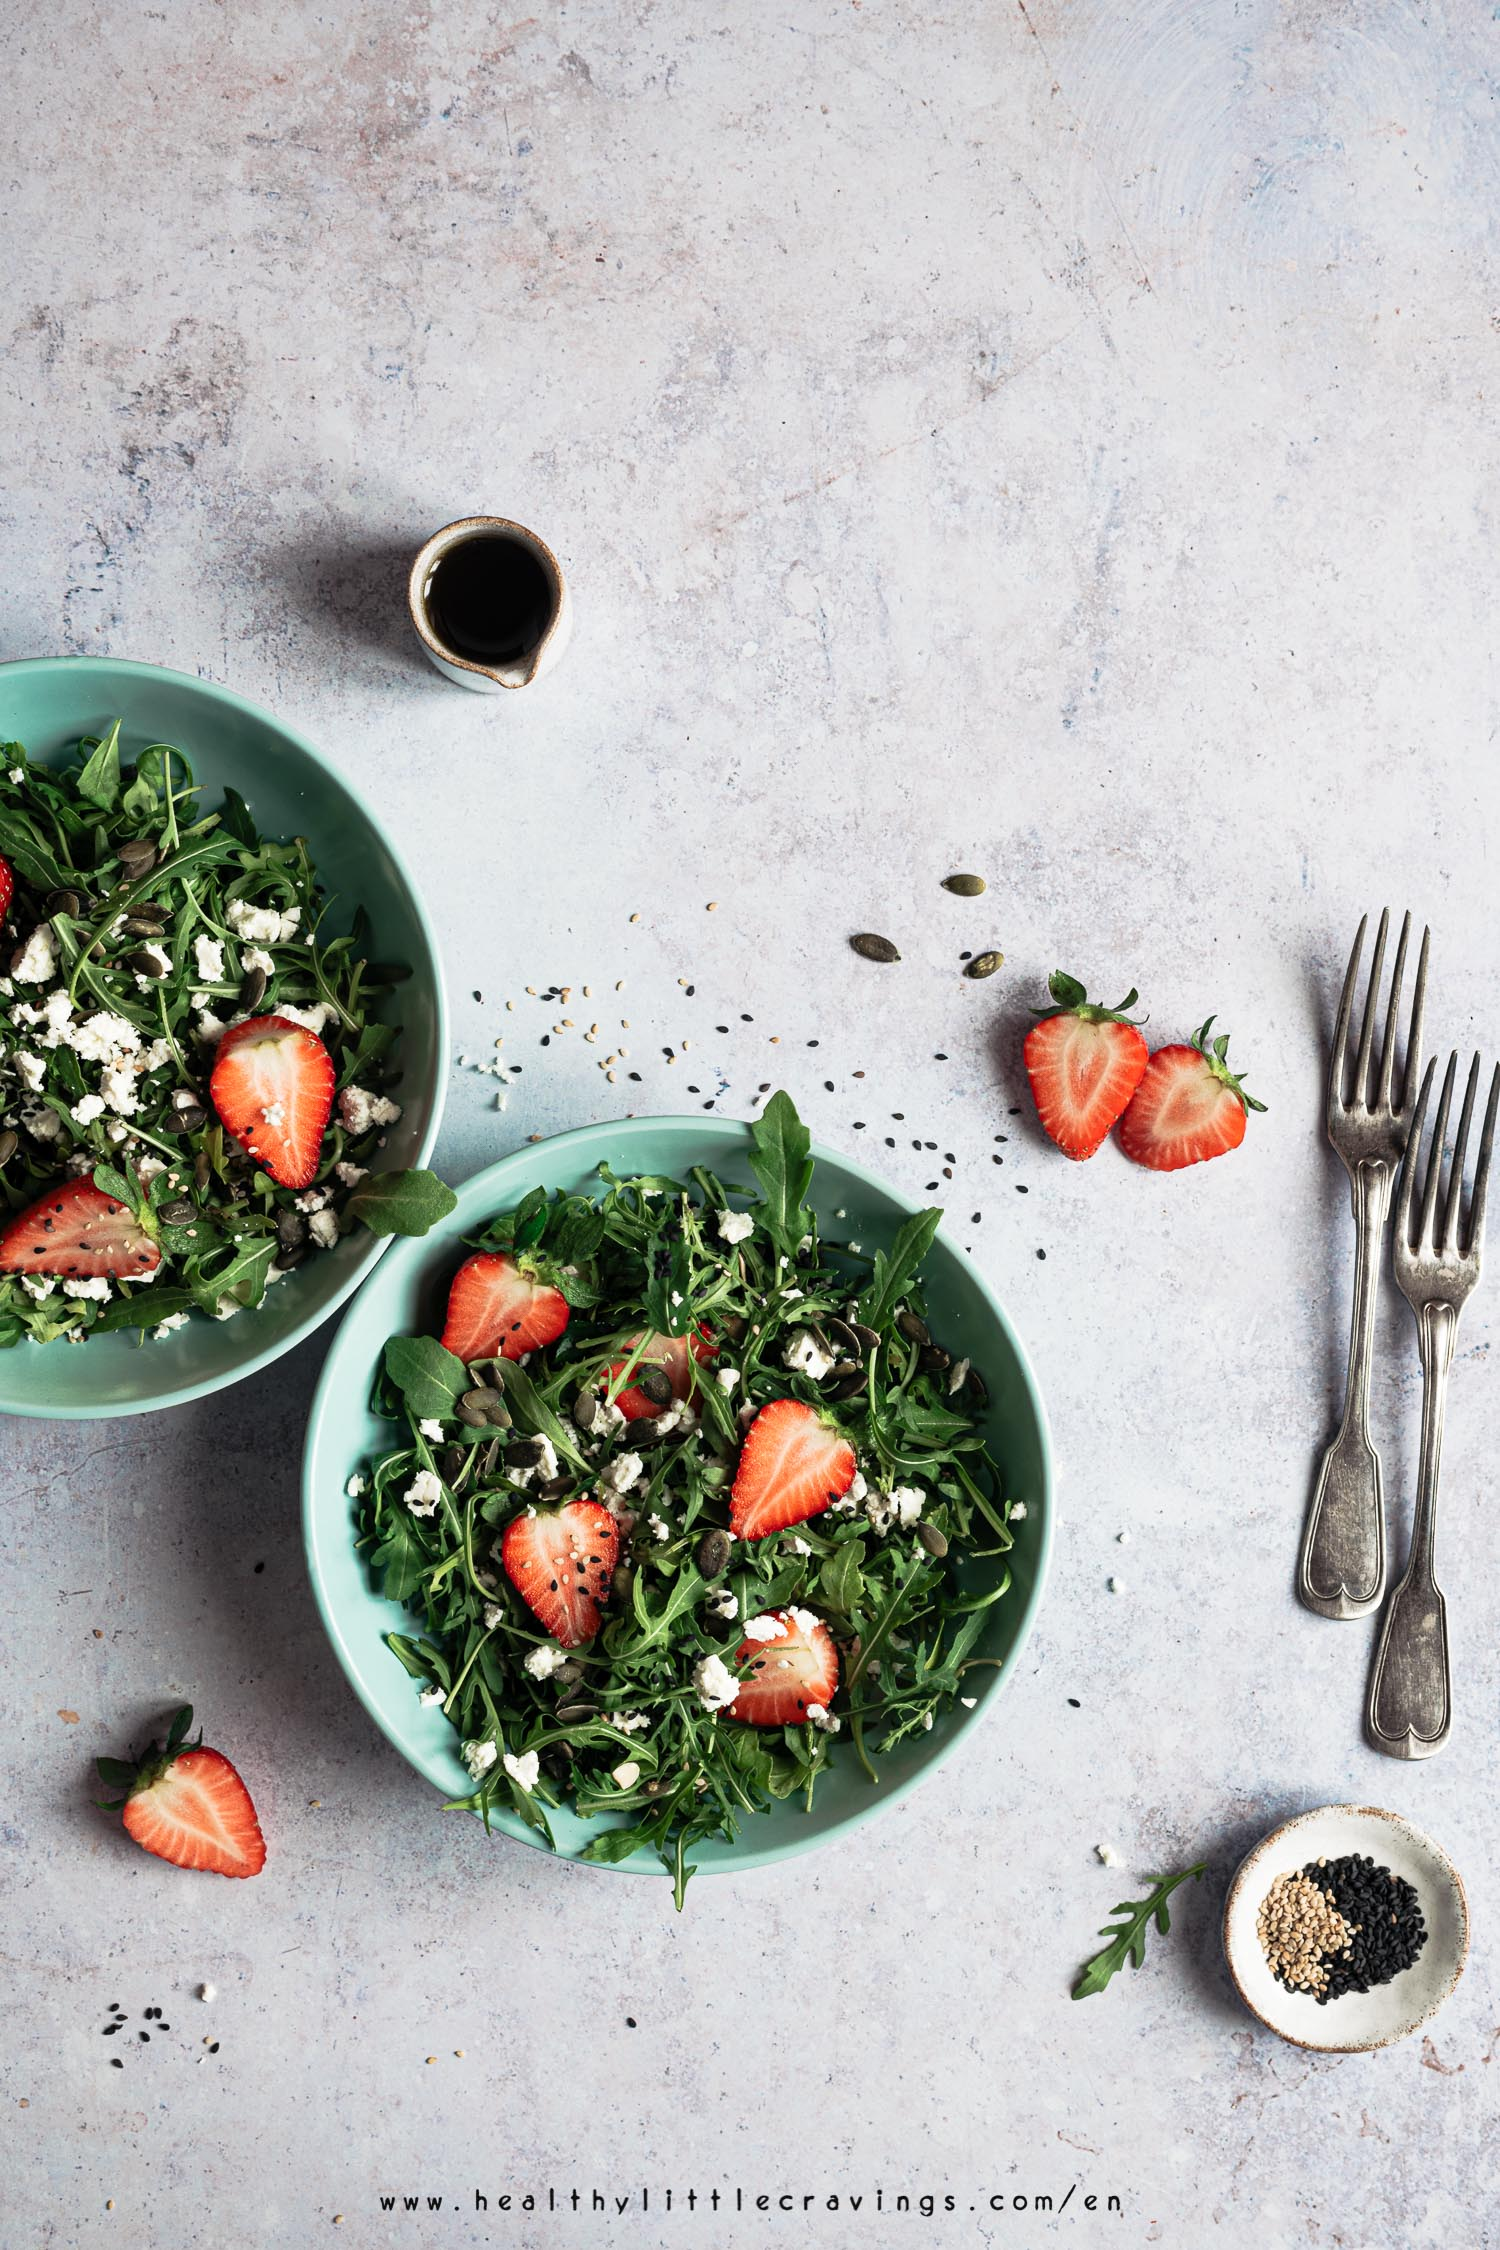 Strawberry arugula salad served into green plates